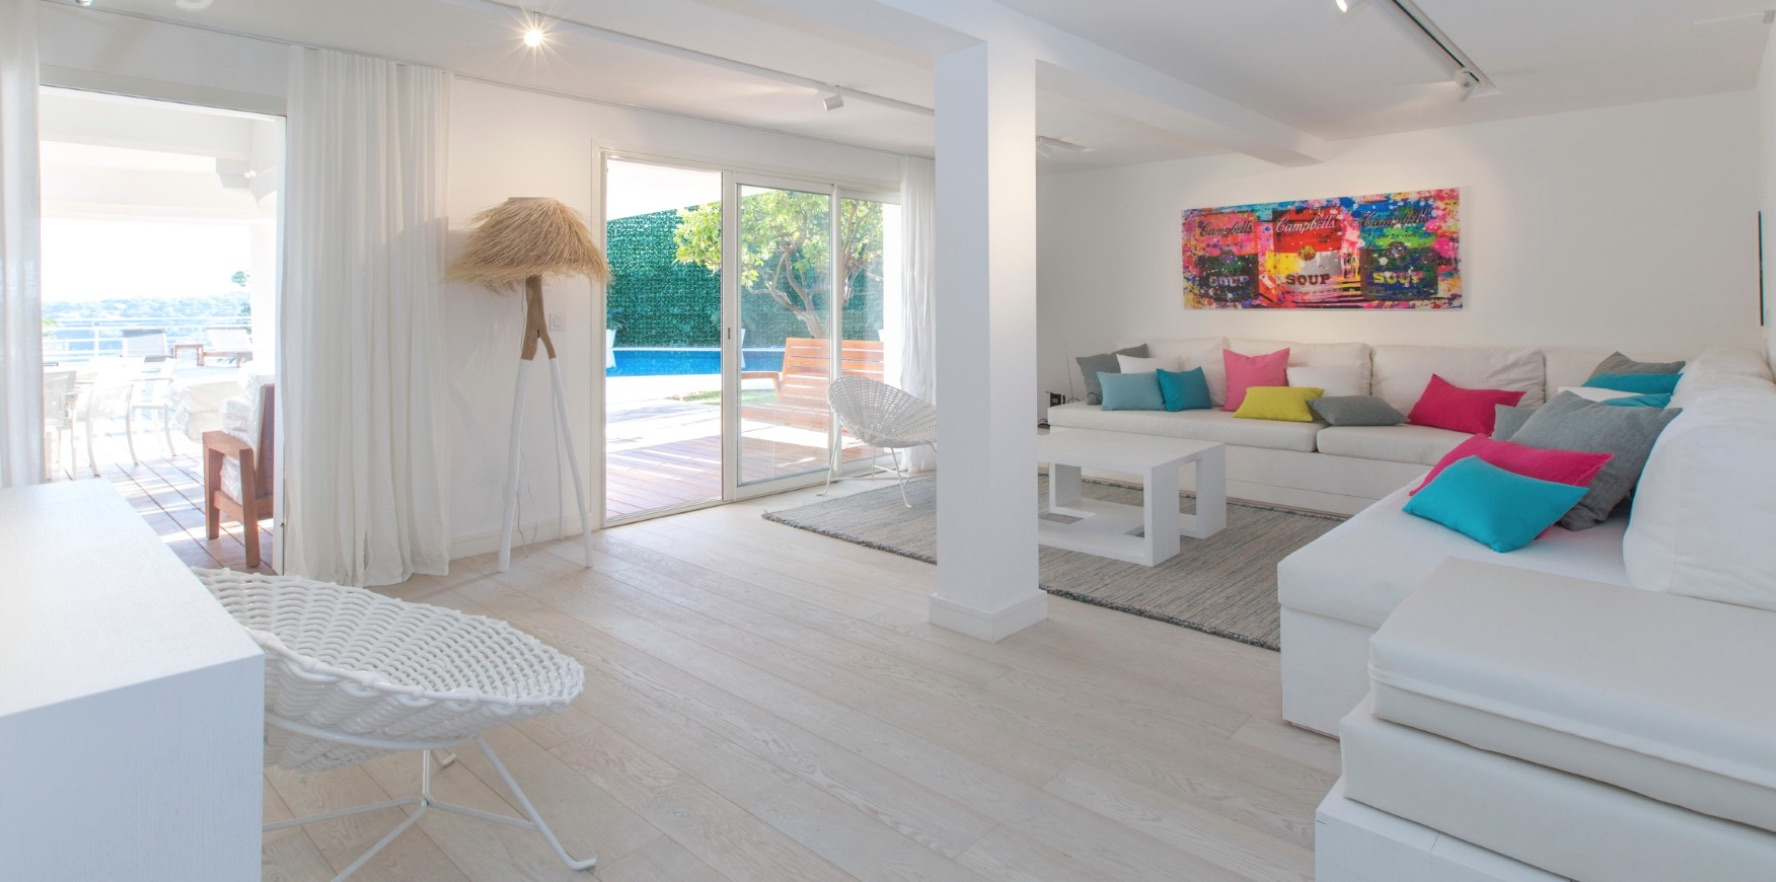 vente villefranche sur mer 320m2 vue sur la rade de. Black Bedroom Furniture Sets. Home Design Ideas